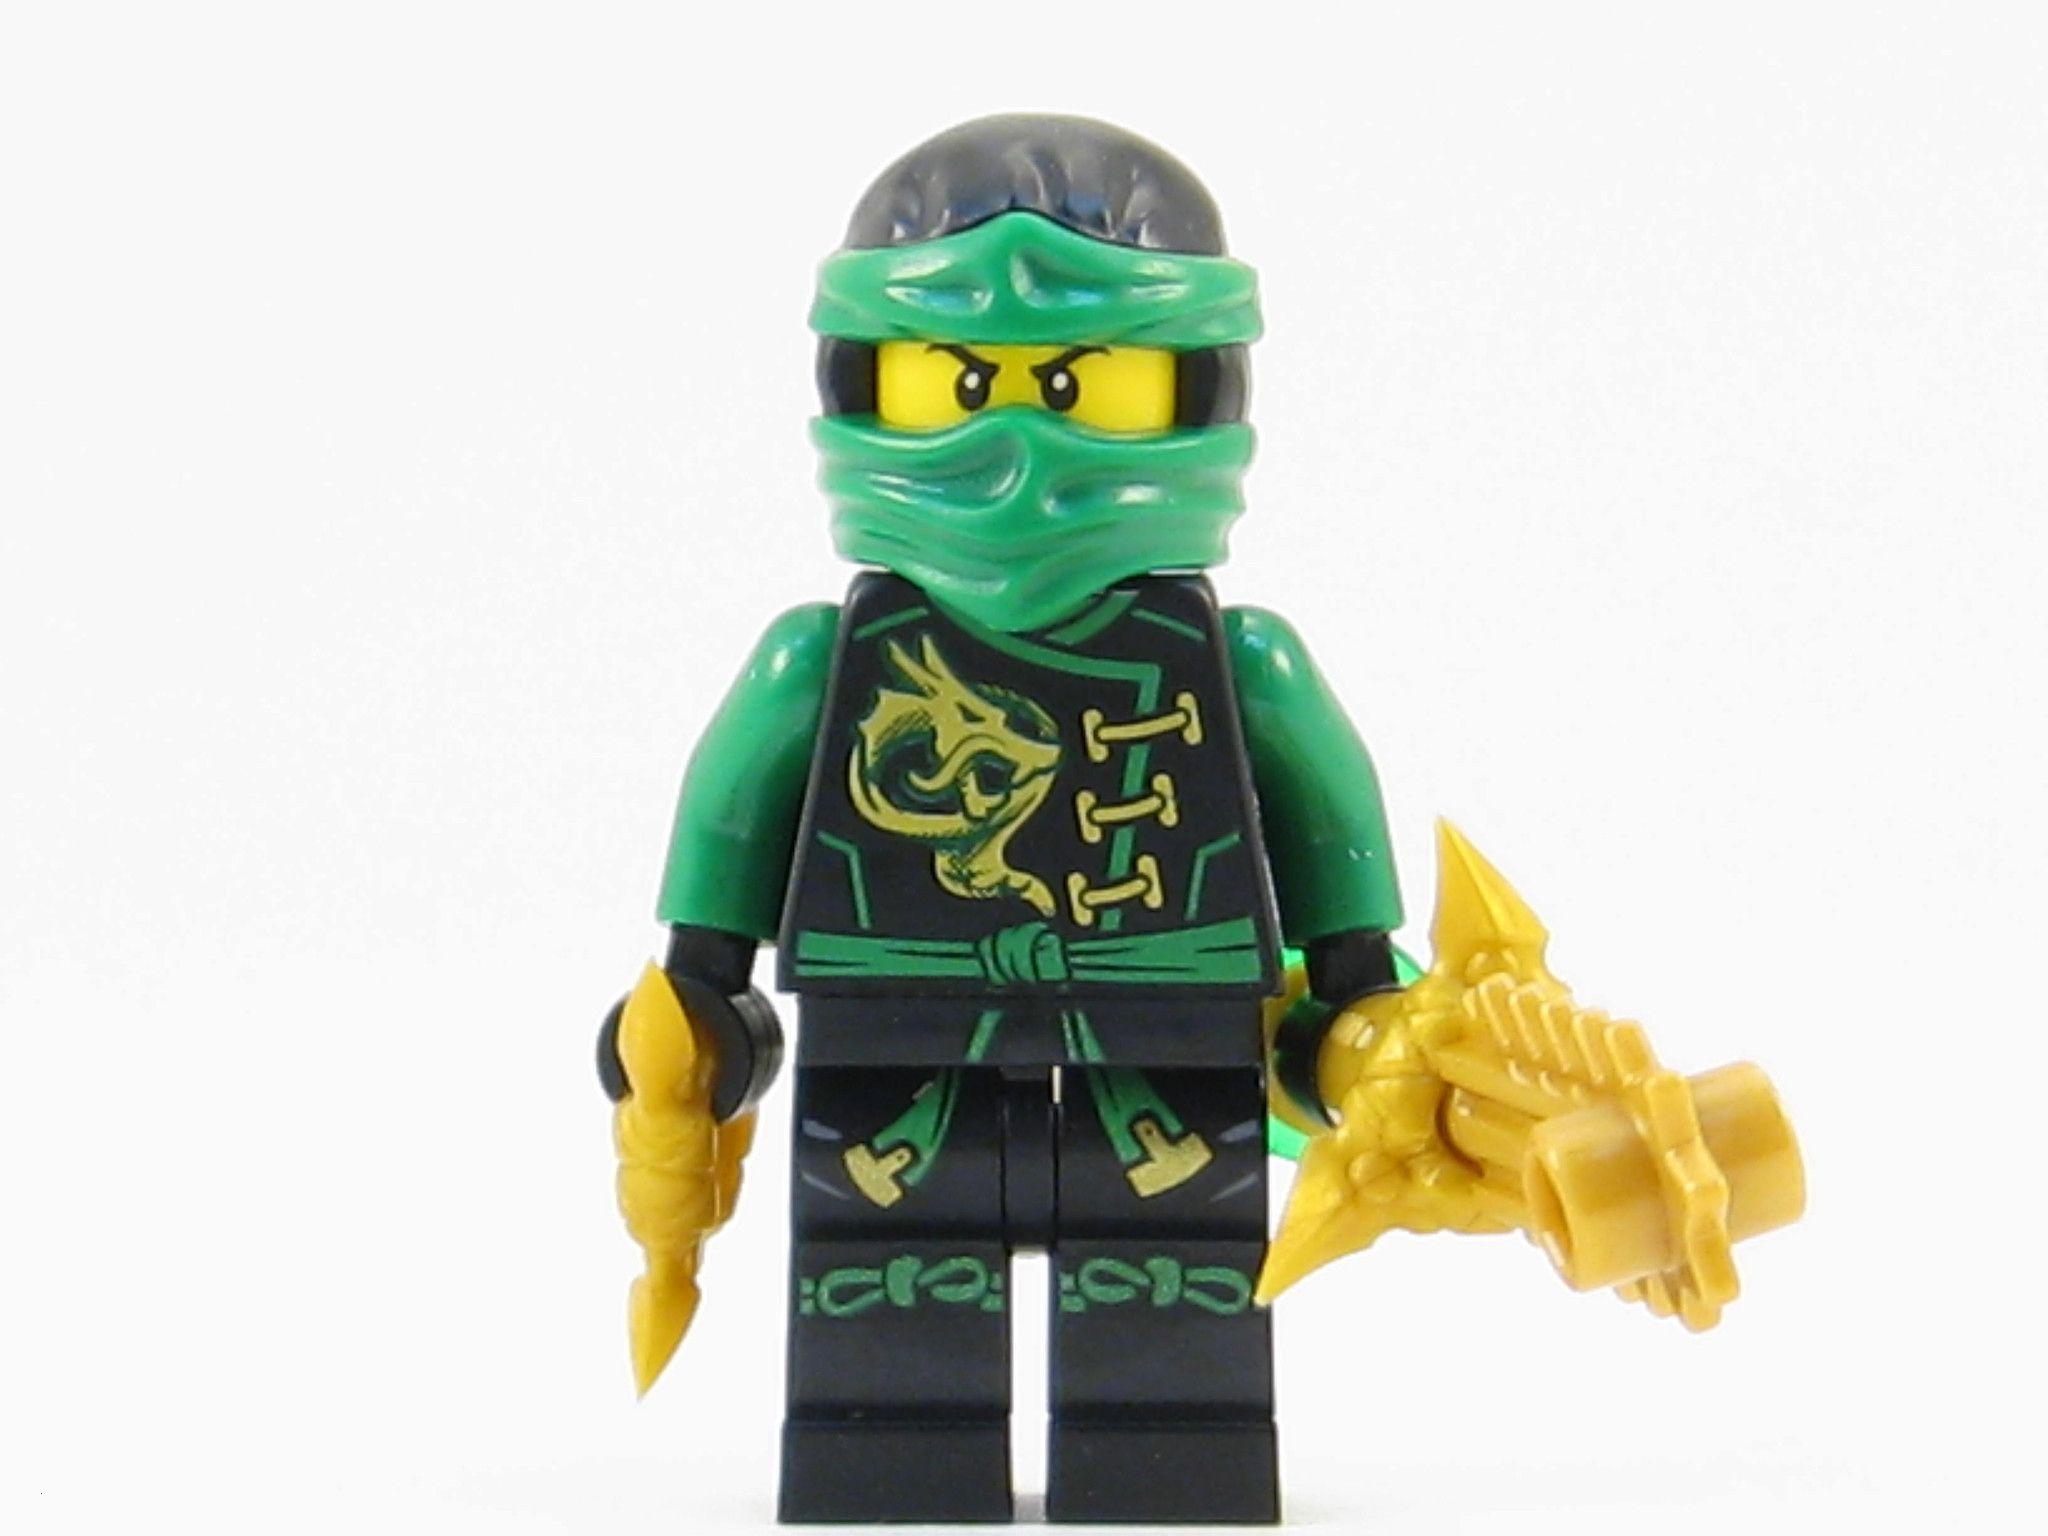 Ninjago Waffen Ausmalbilder Inspirierend Lego Ninjago Skybound Lloyd Green Ninja Minifigure Sky Pirate New Fotos